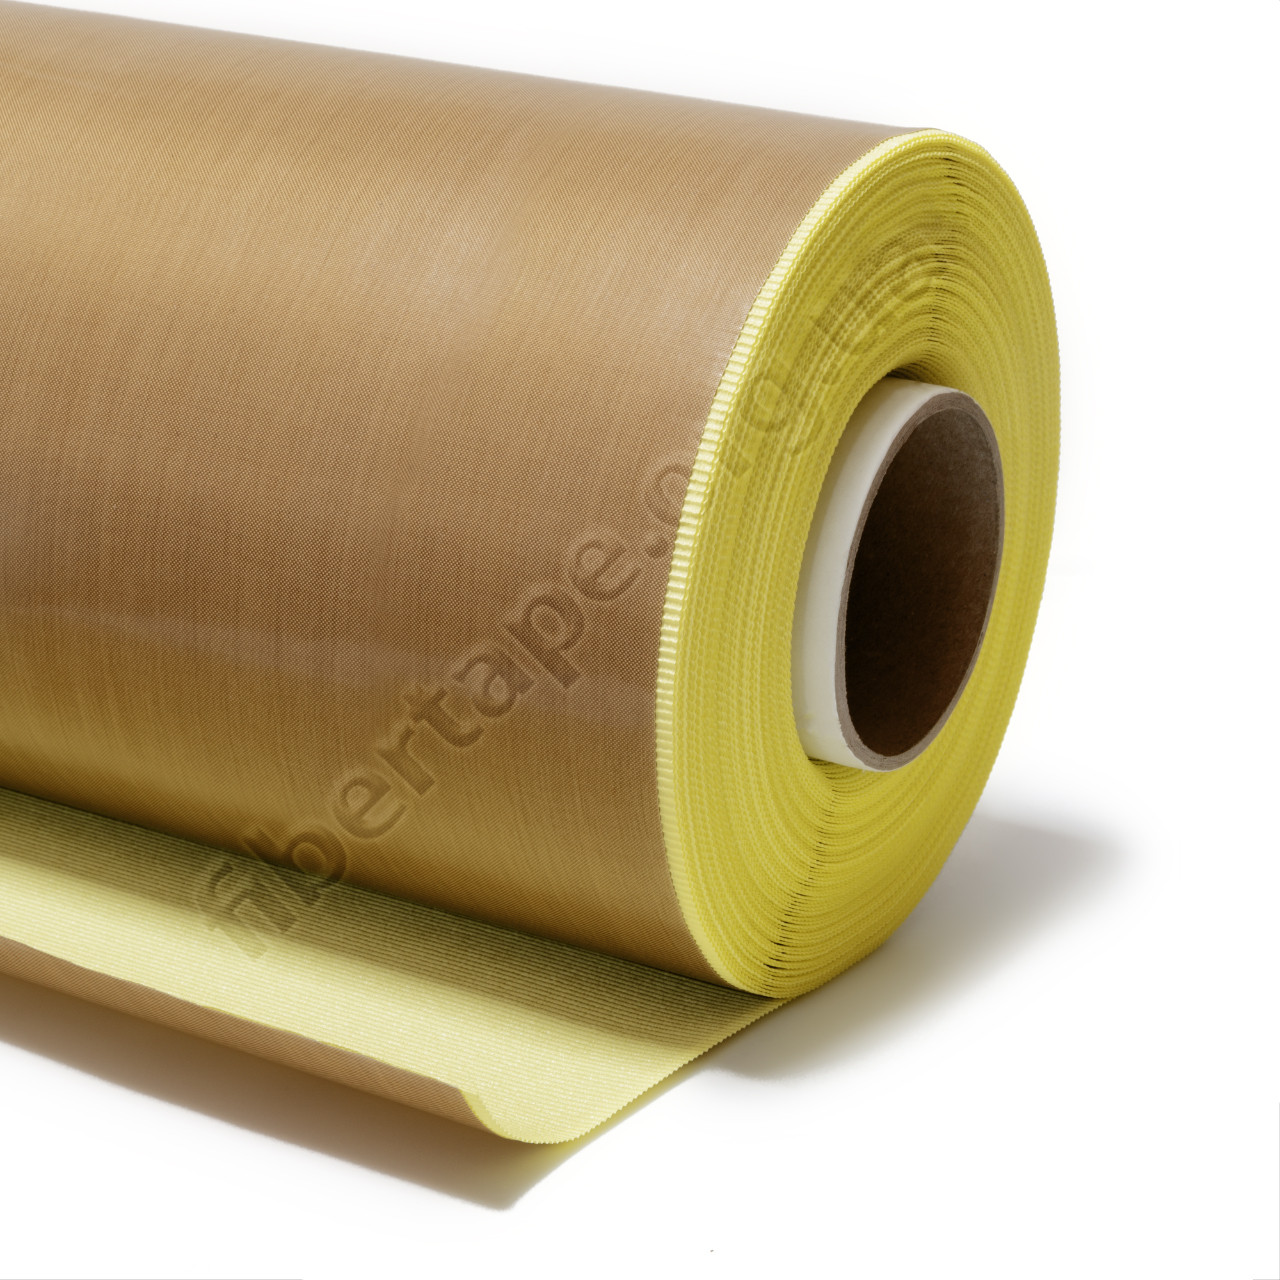 Тефлоновая лента (пленка) с клеем 110 микрон